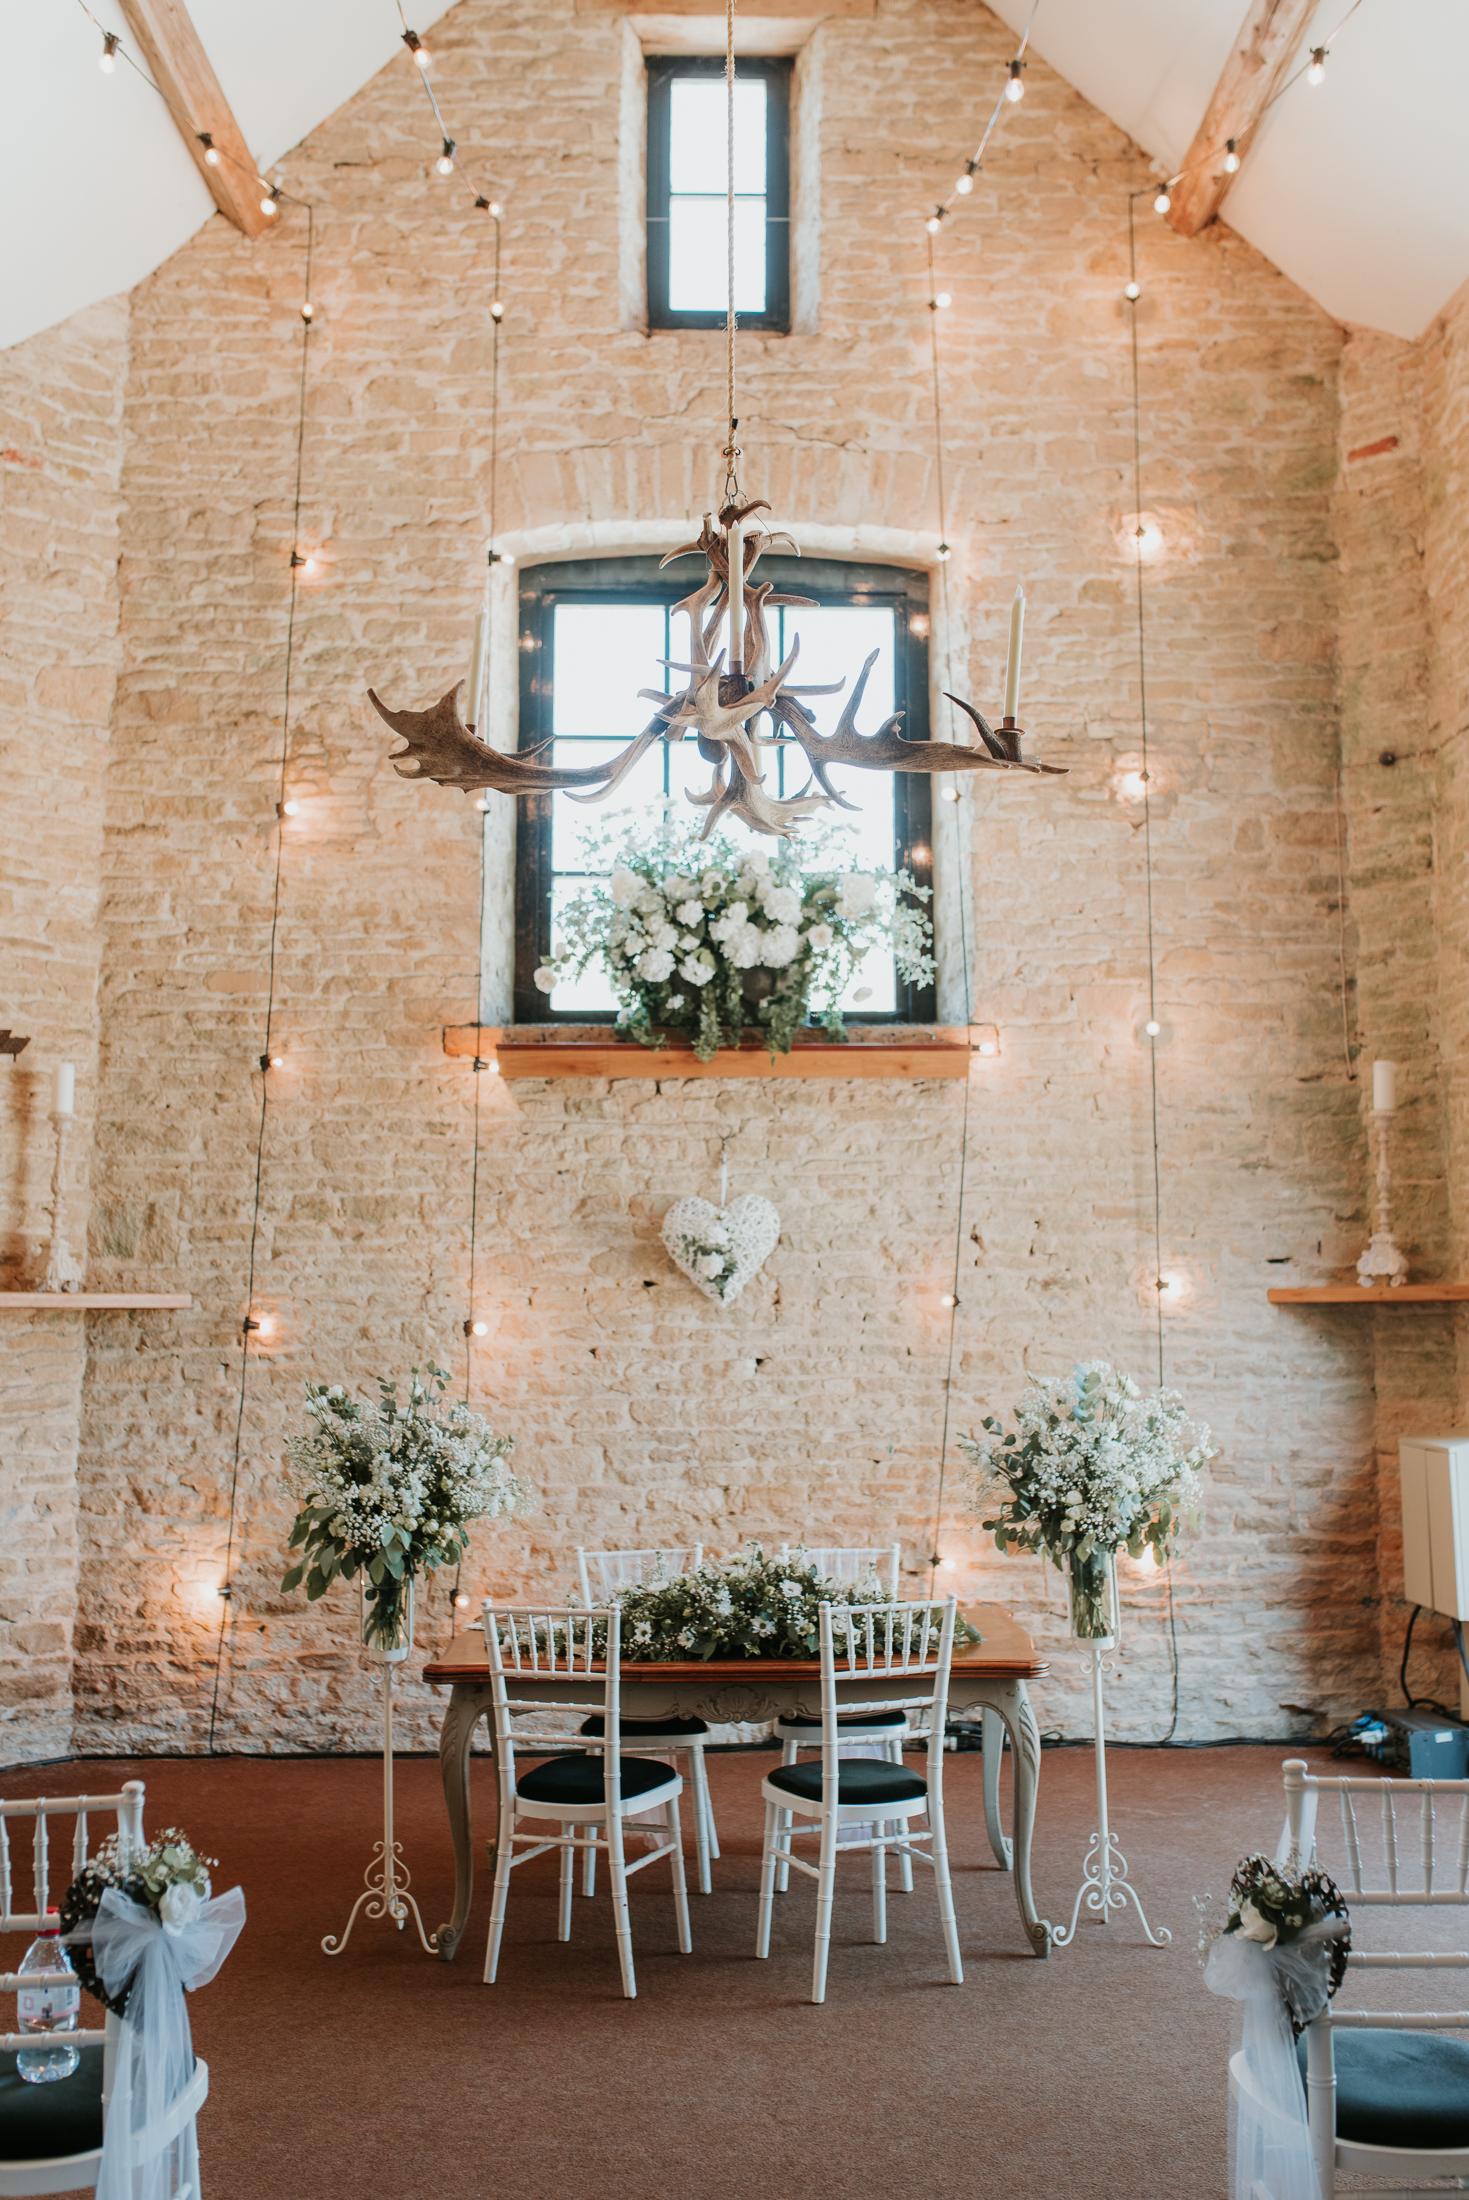 Oxfordshire-wedding-photographer-15.jpg